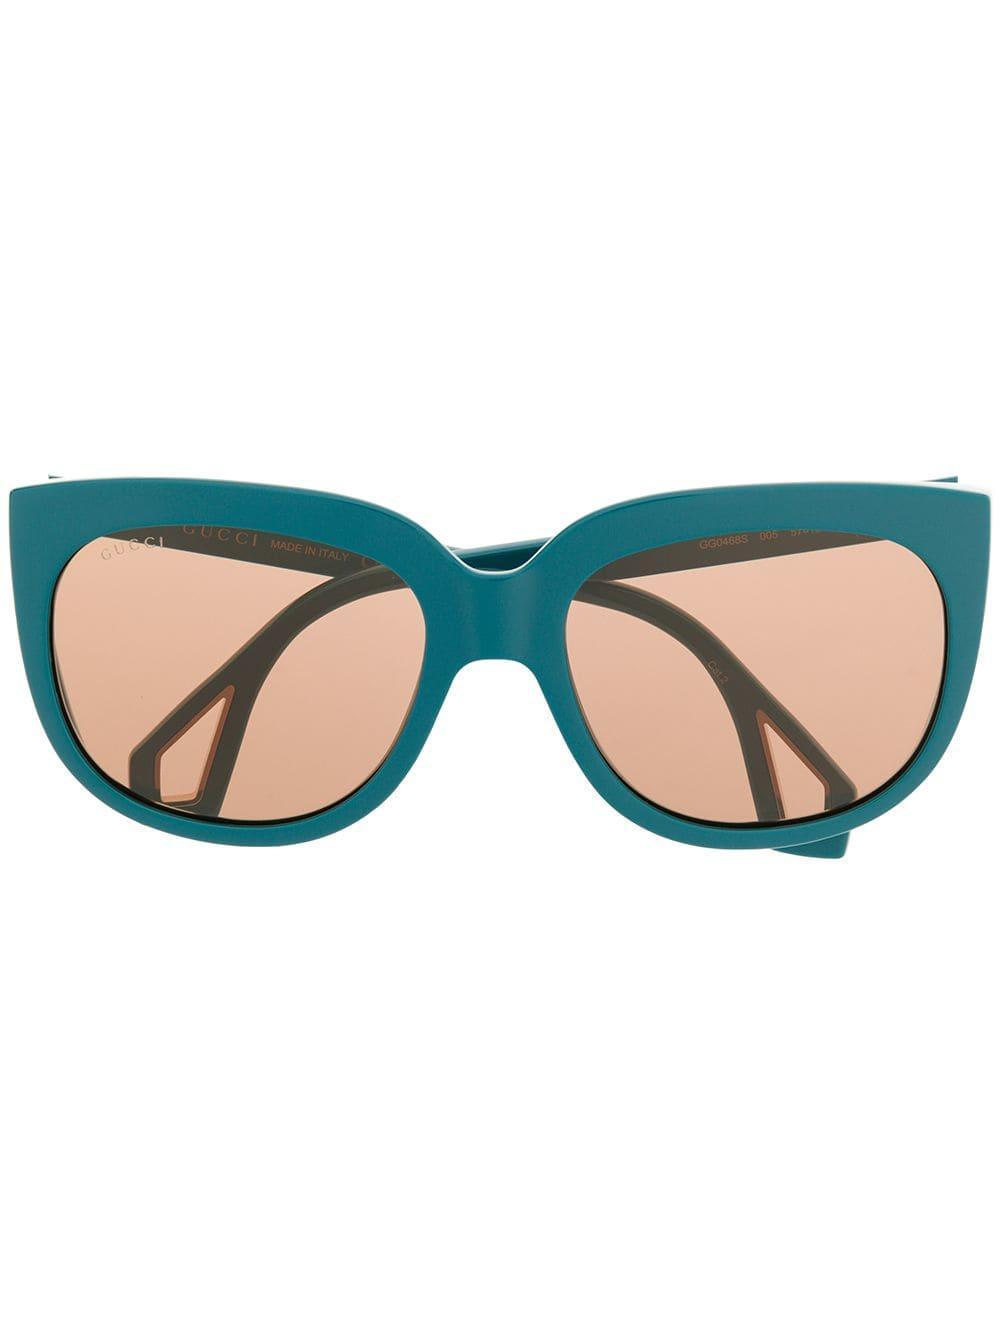 ecf1898daa1 Lyst - Gucci Side Window Frame Sunglasses in Blue